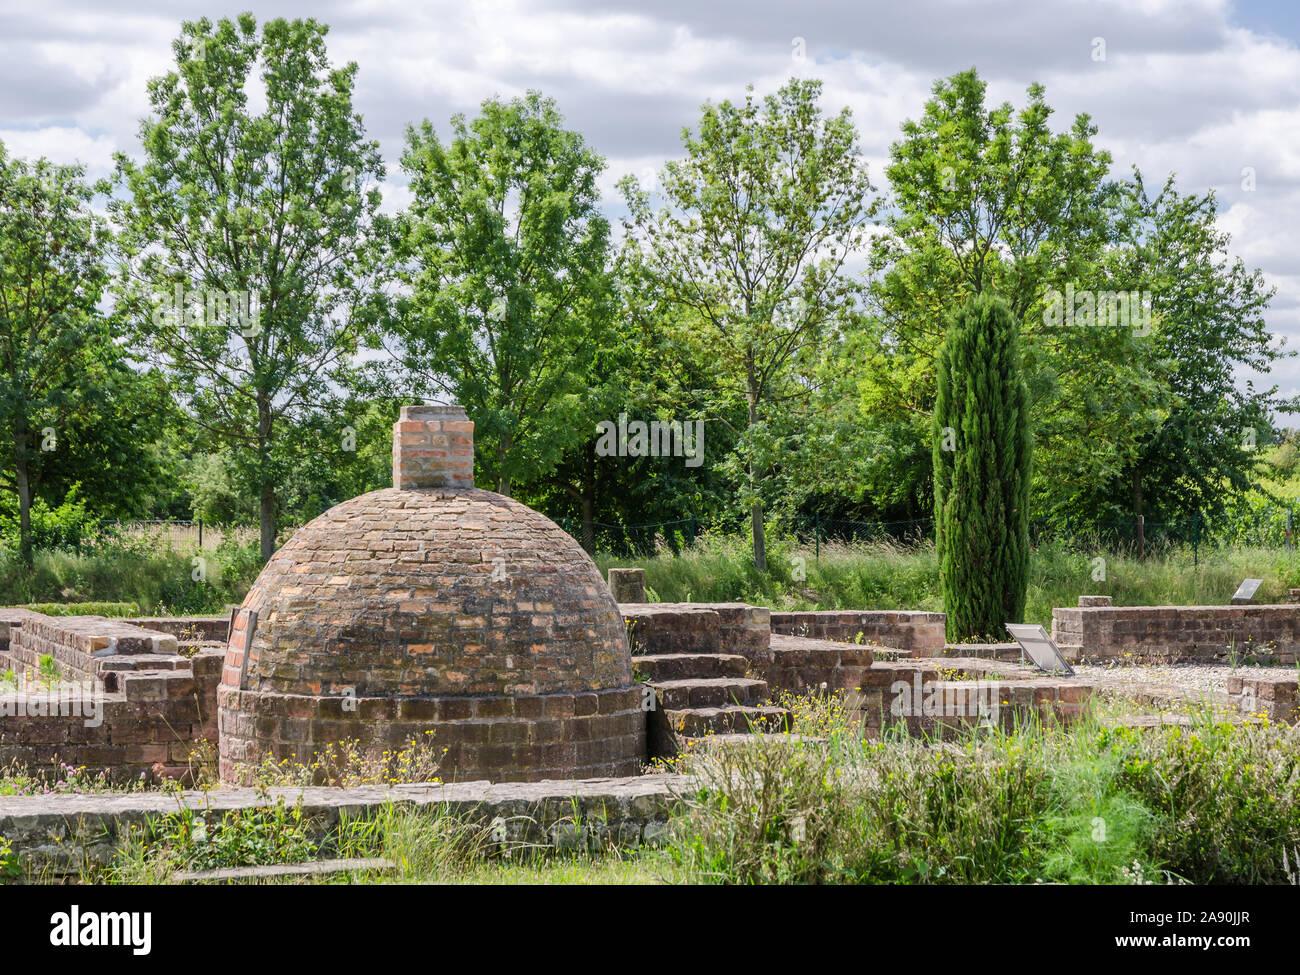 Roman estate at the German Wine Route, Rhineland-Palatinate, Germany Stock Photo